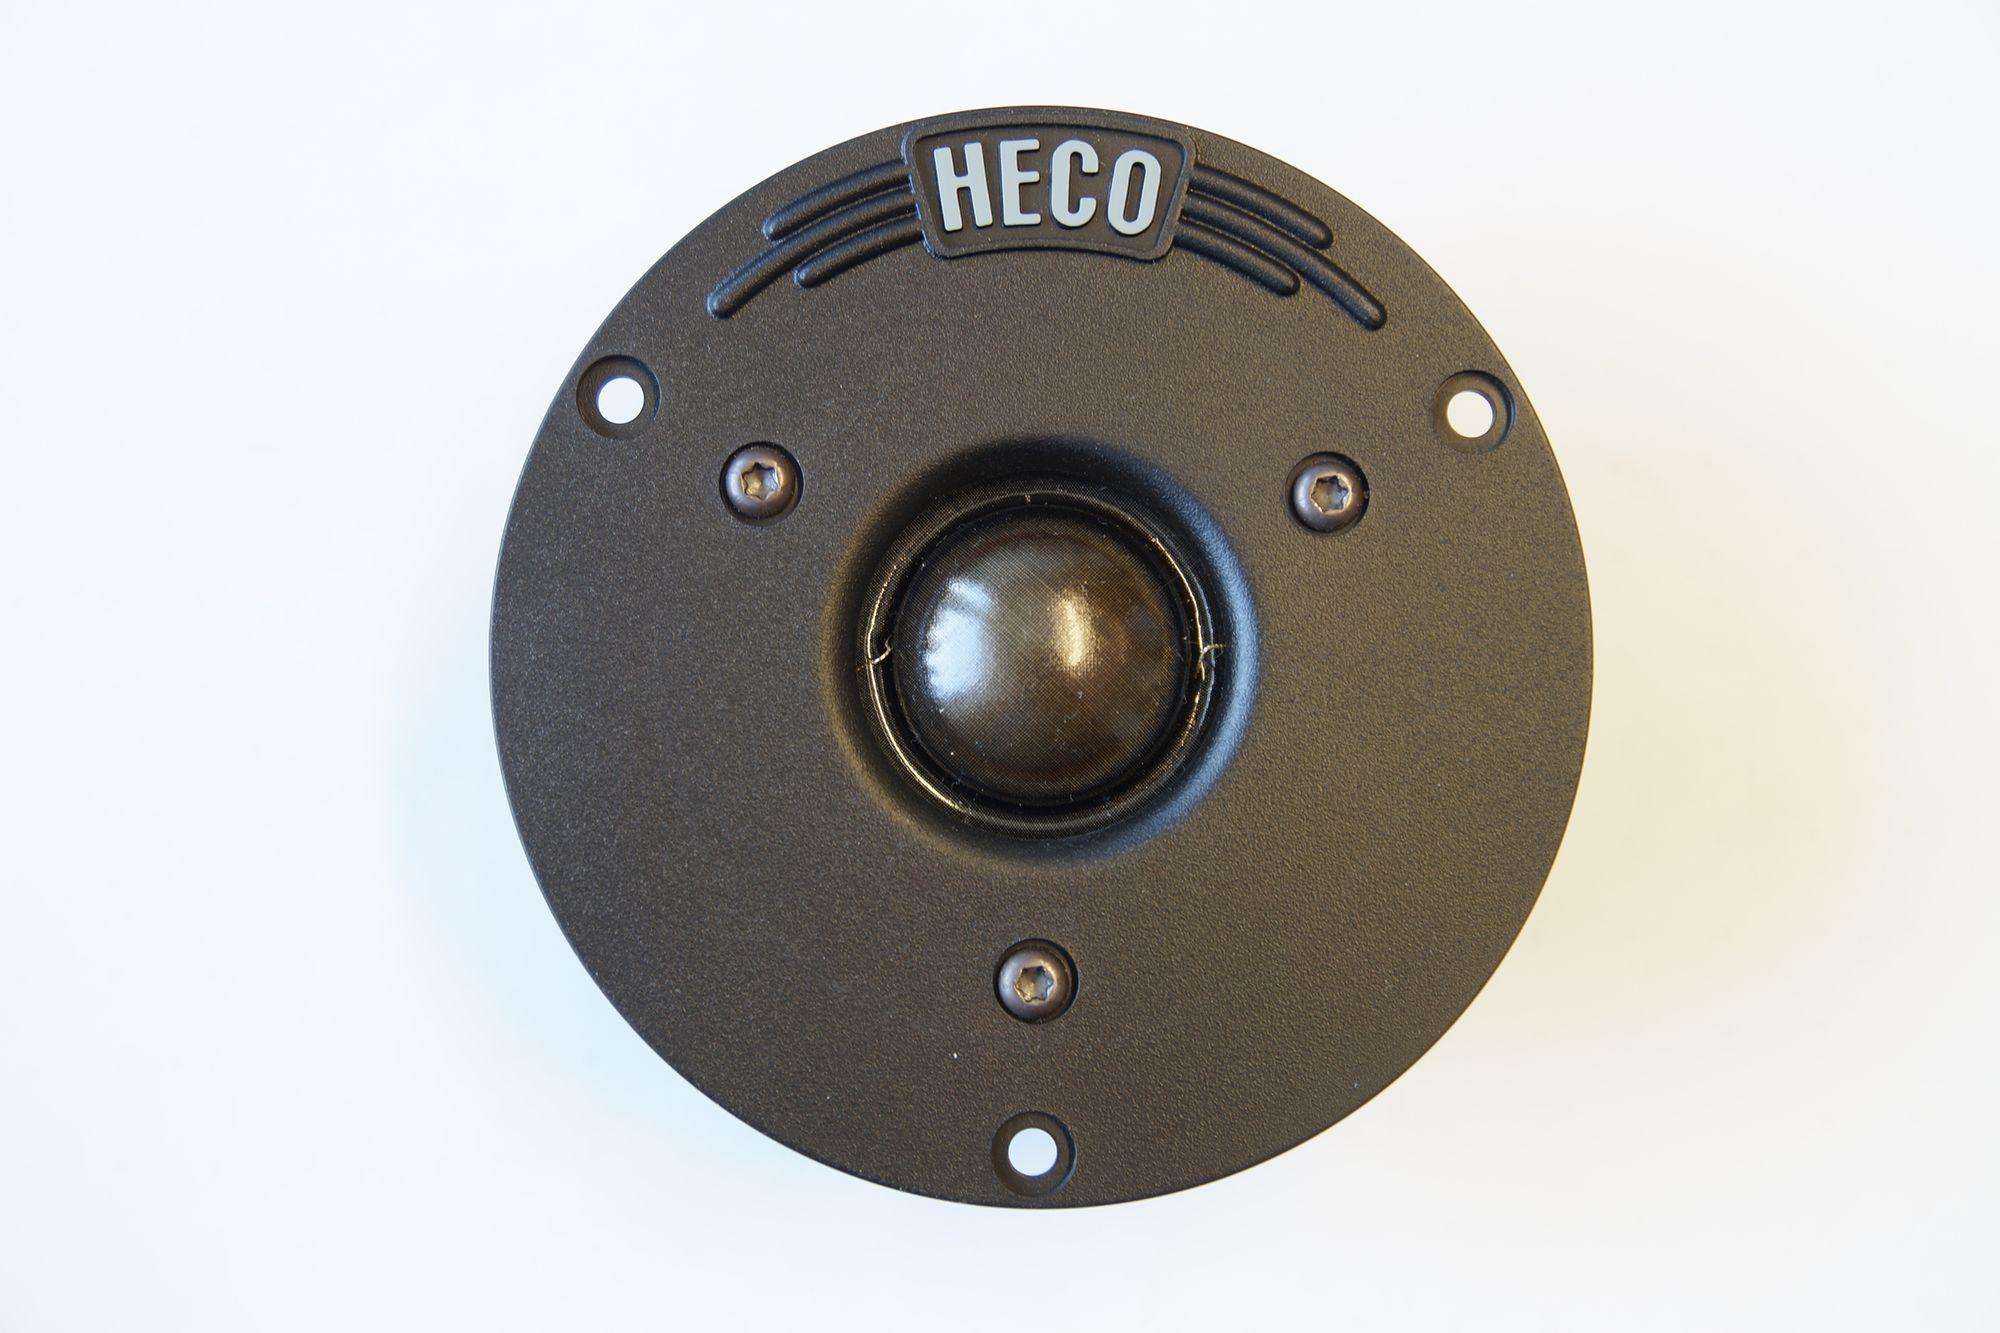 Heco Argon Reference Hochtöner HT 28 K-GE 470SX Neu